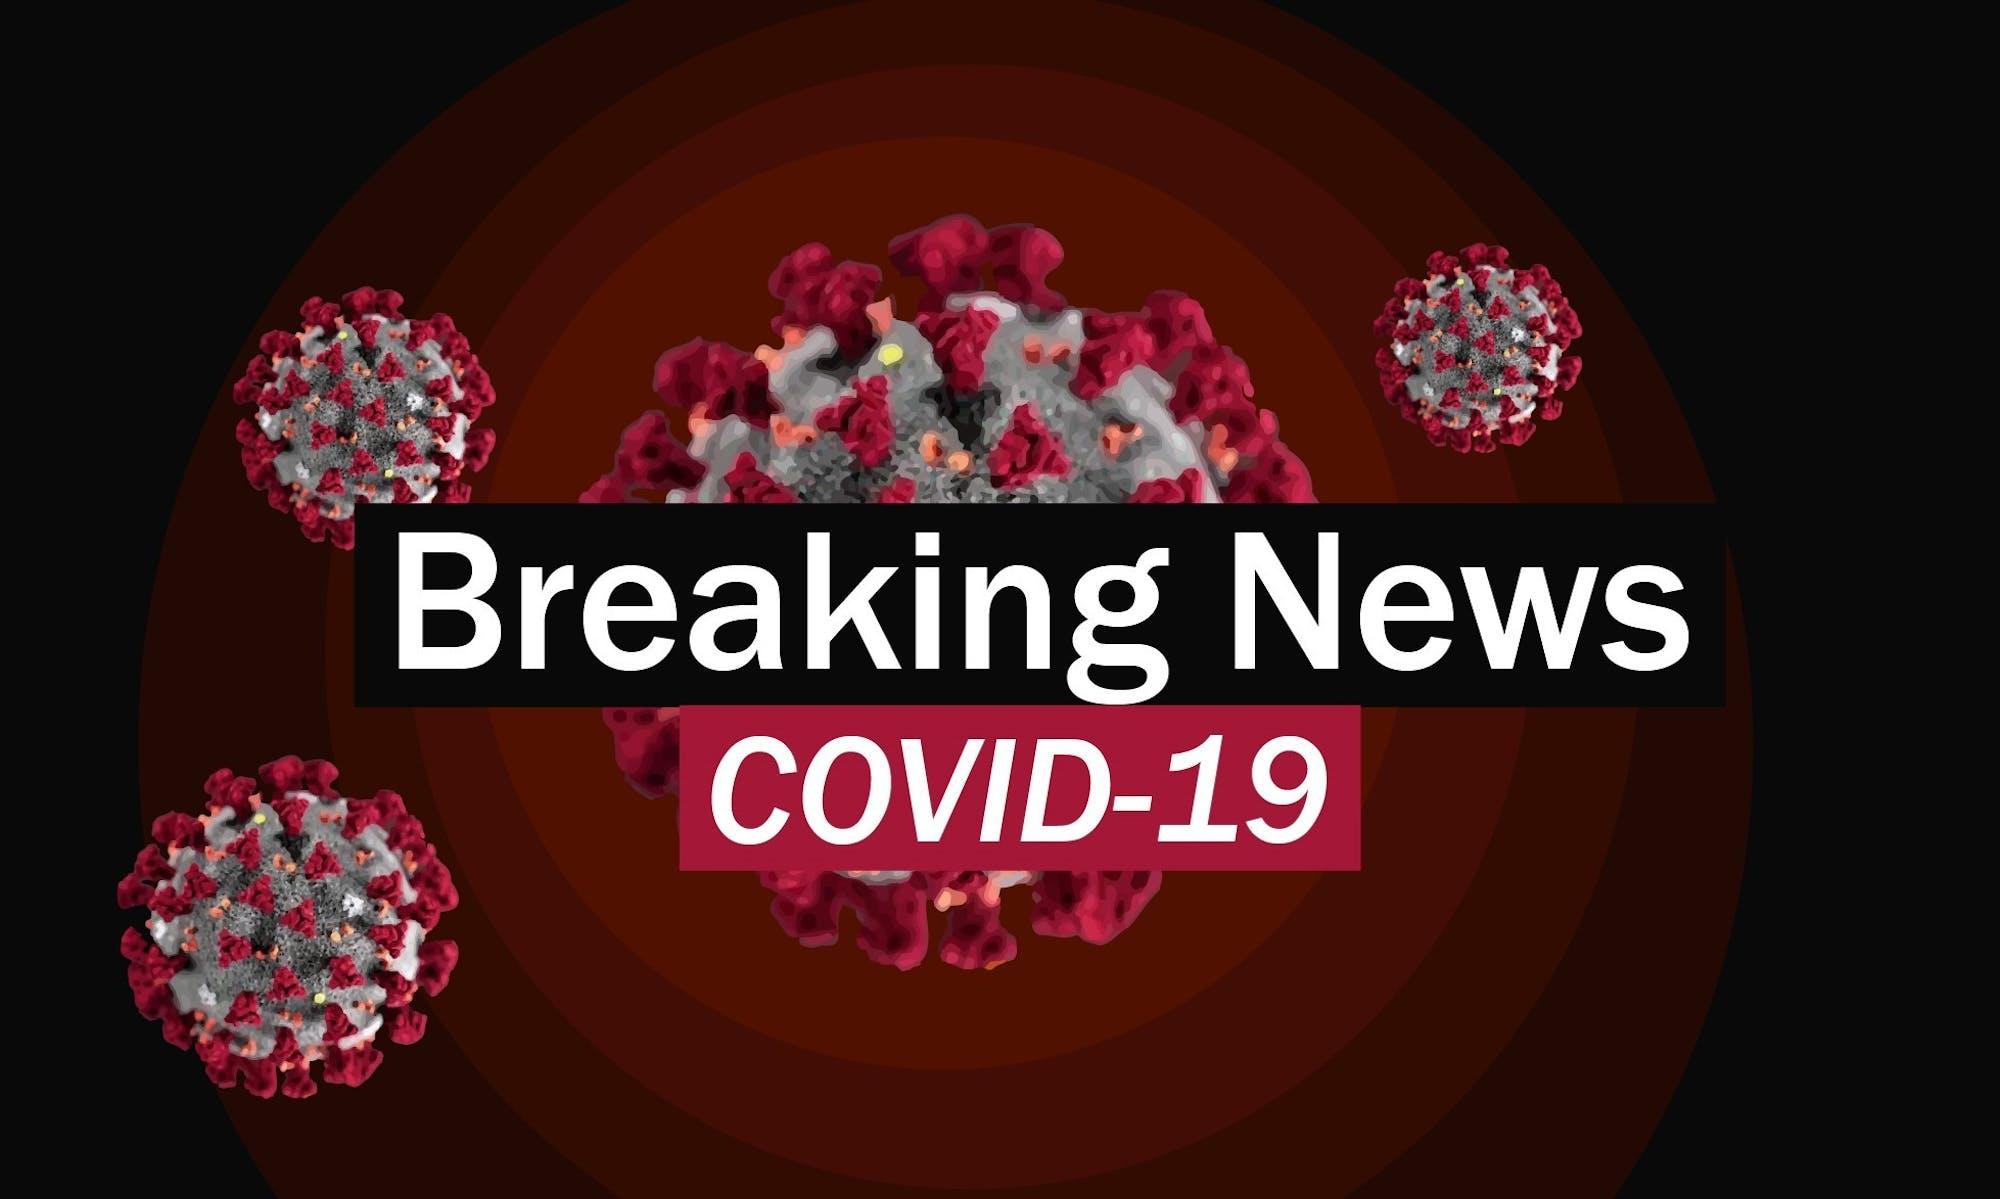 breaking-news-covid-19